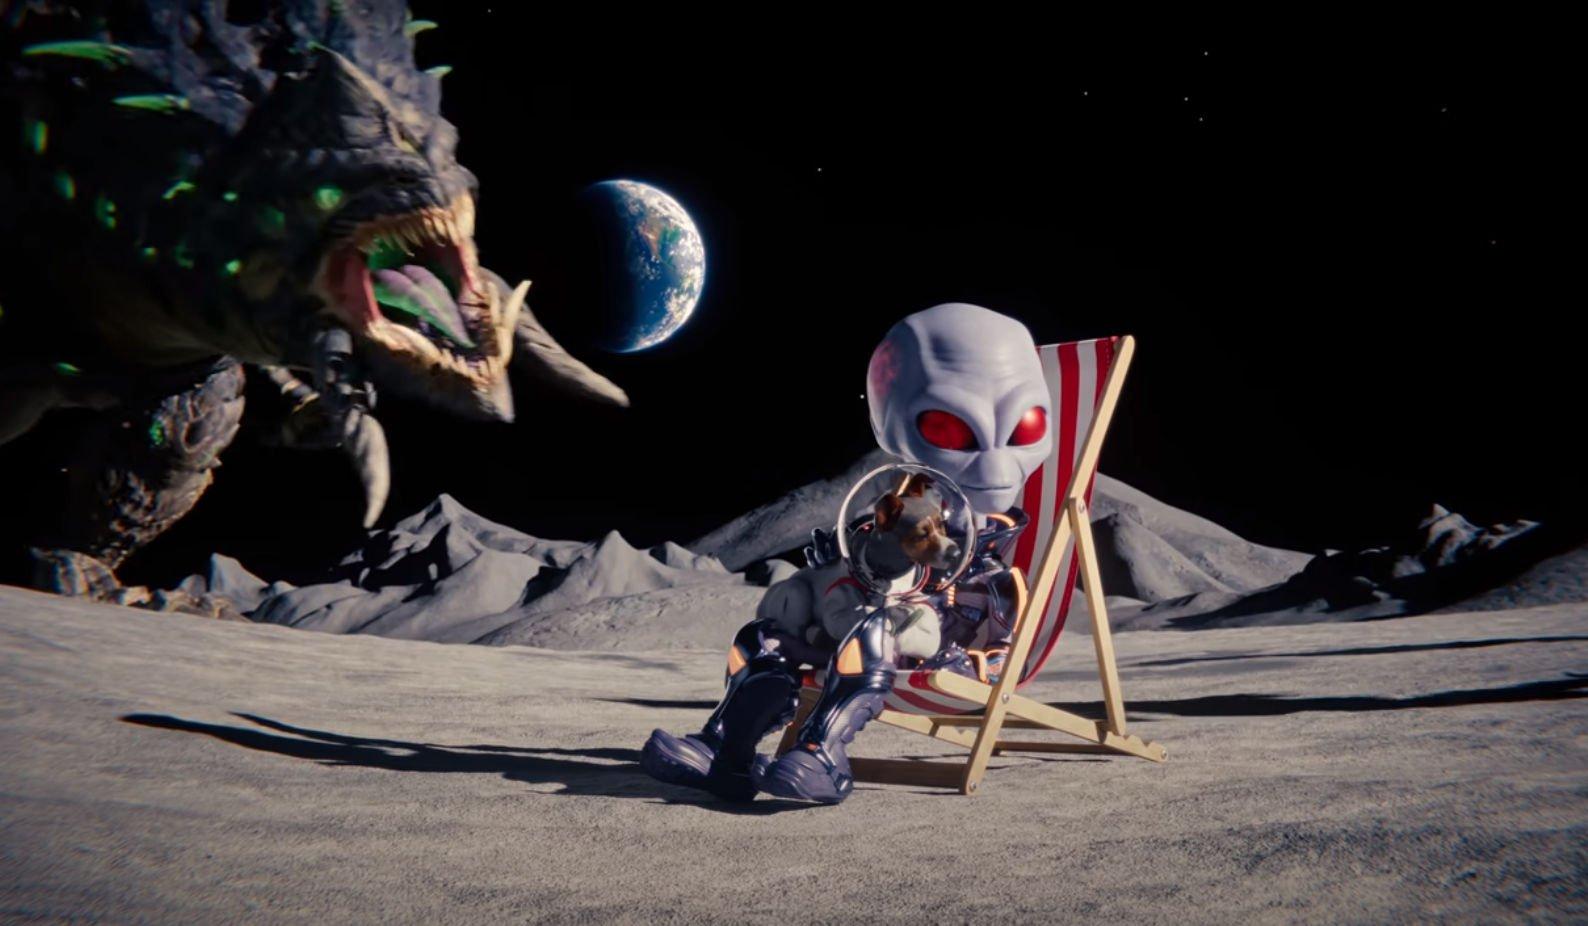 Crypto on the moon